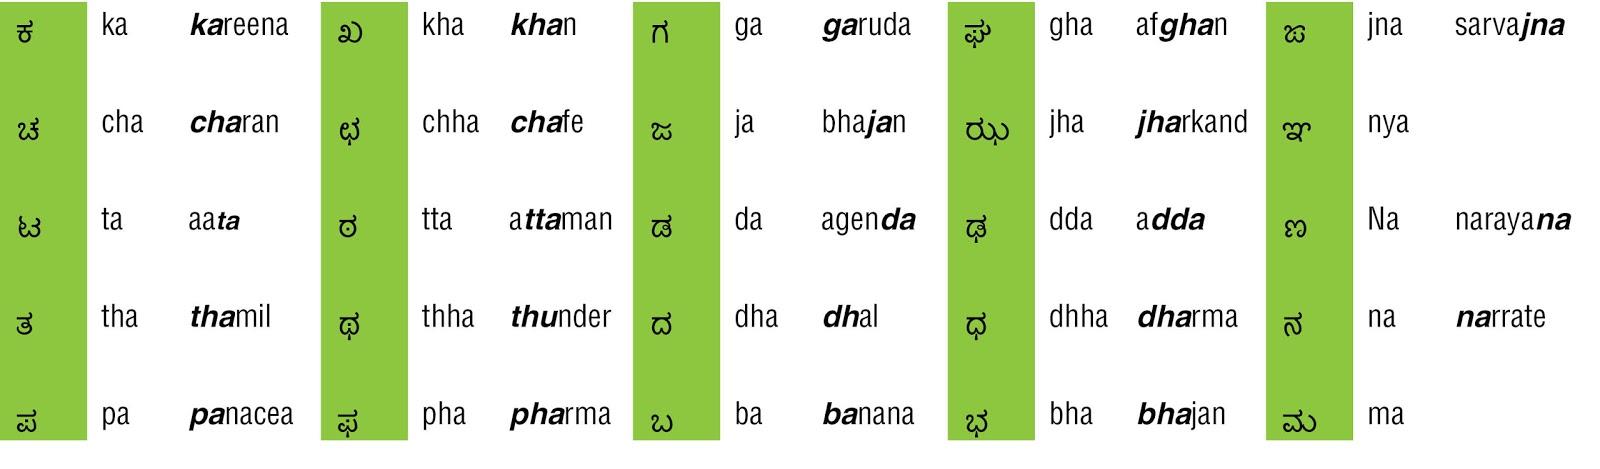 Learn Kannada - Worksheets  Konkani Alphabets Related